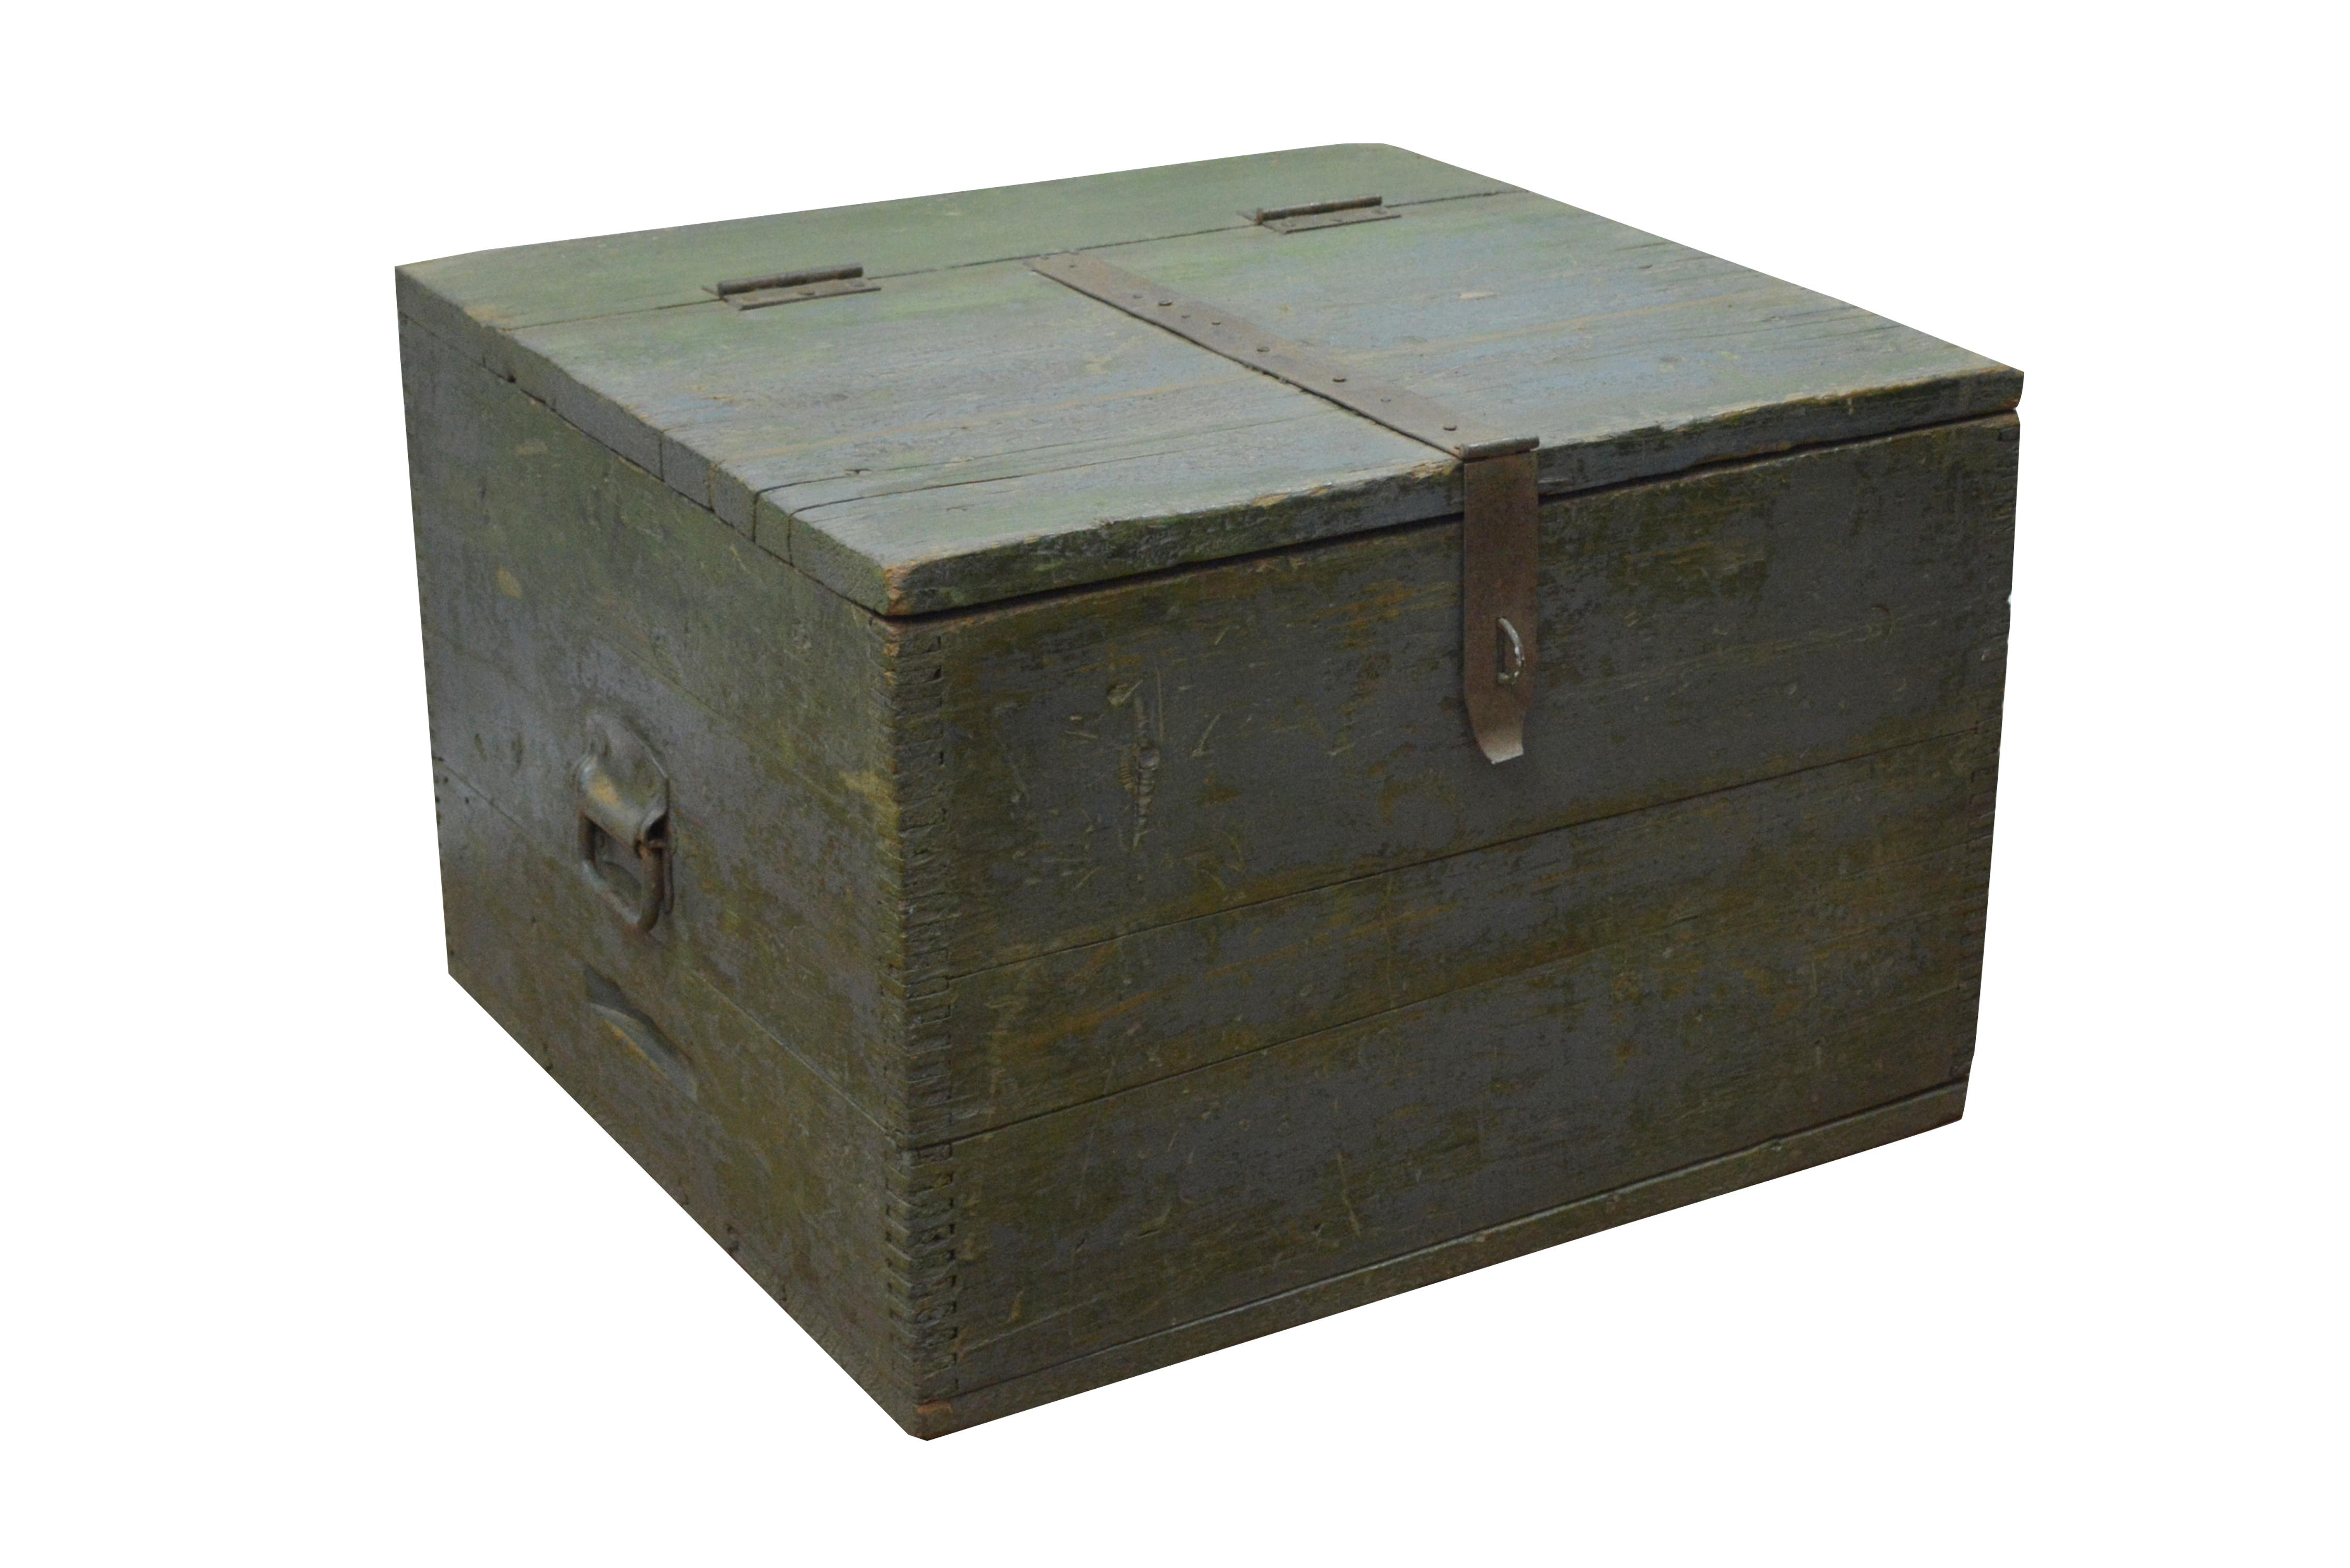 ANRA1763 - 60 x 56 x 40 cm